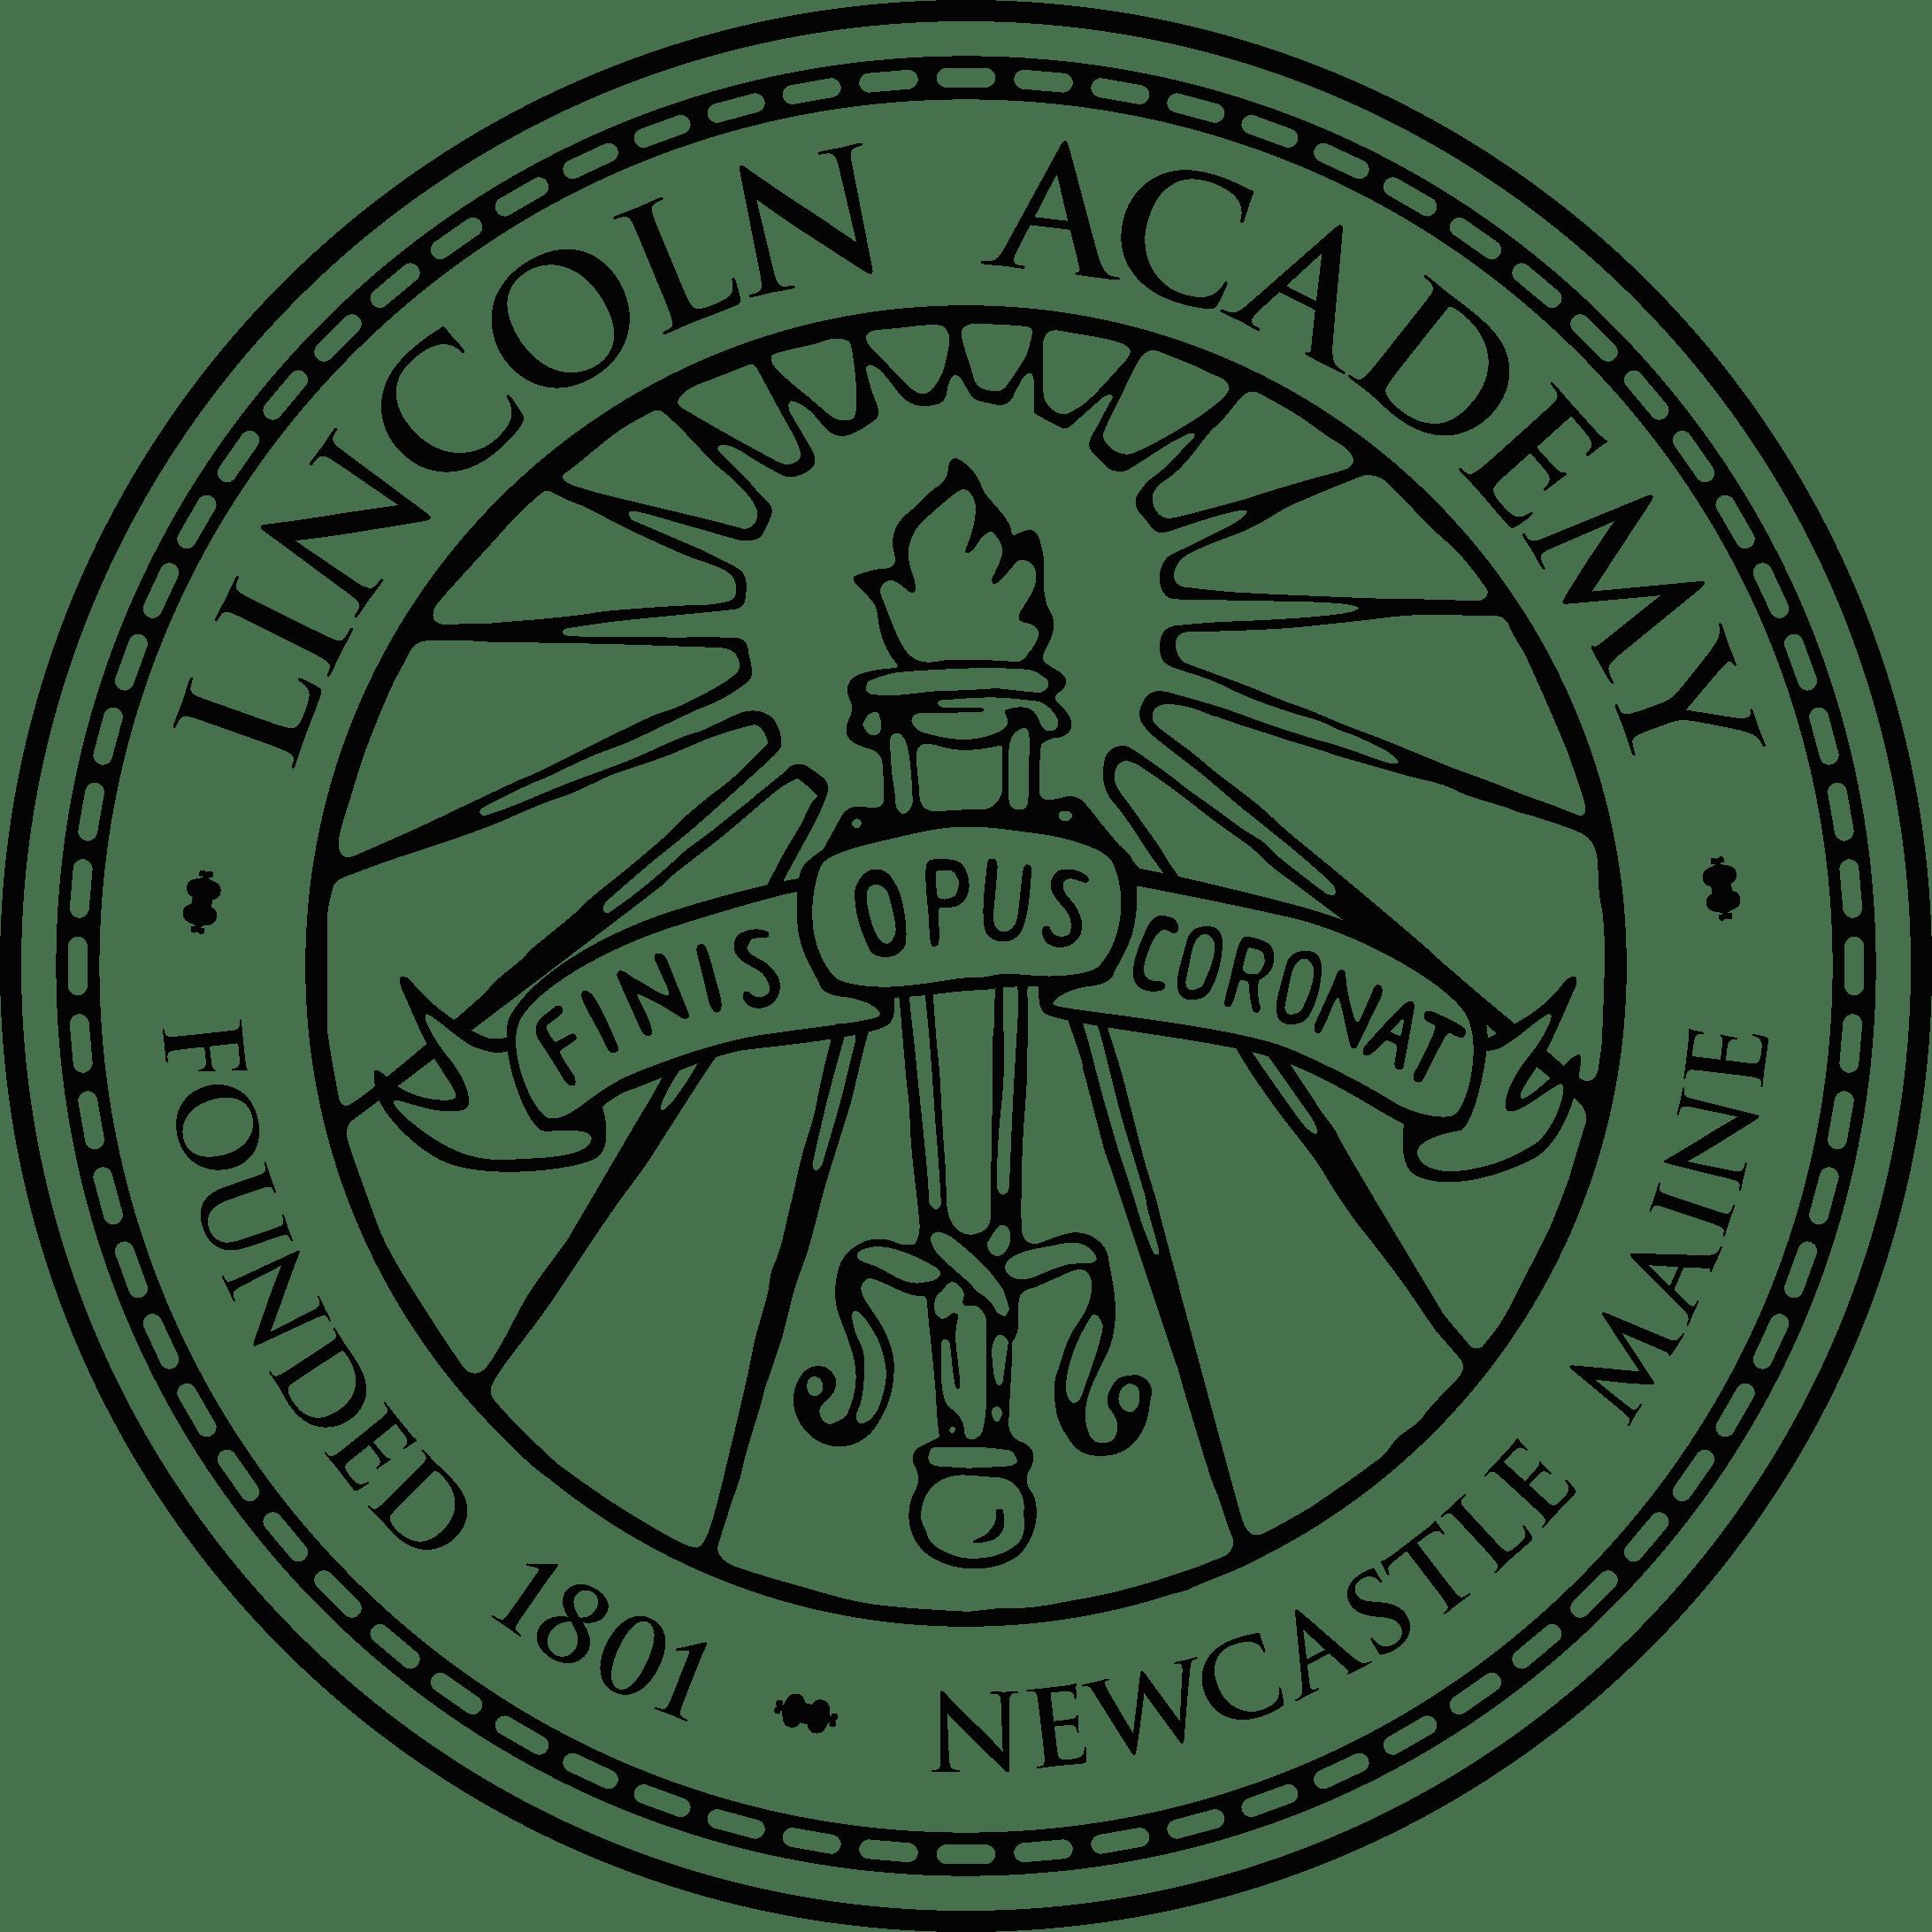 Lincoln Academy; rok liceum w usa